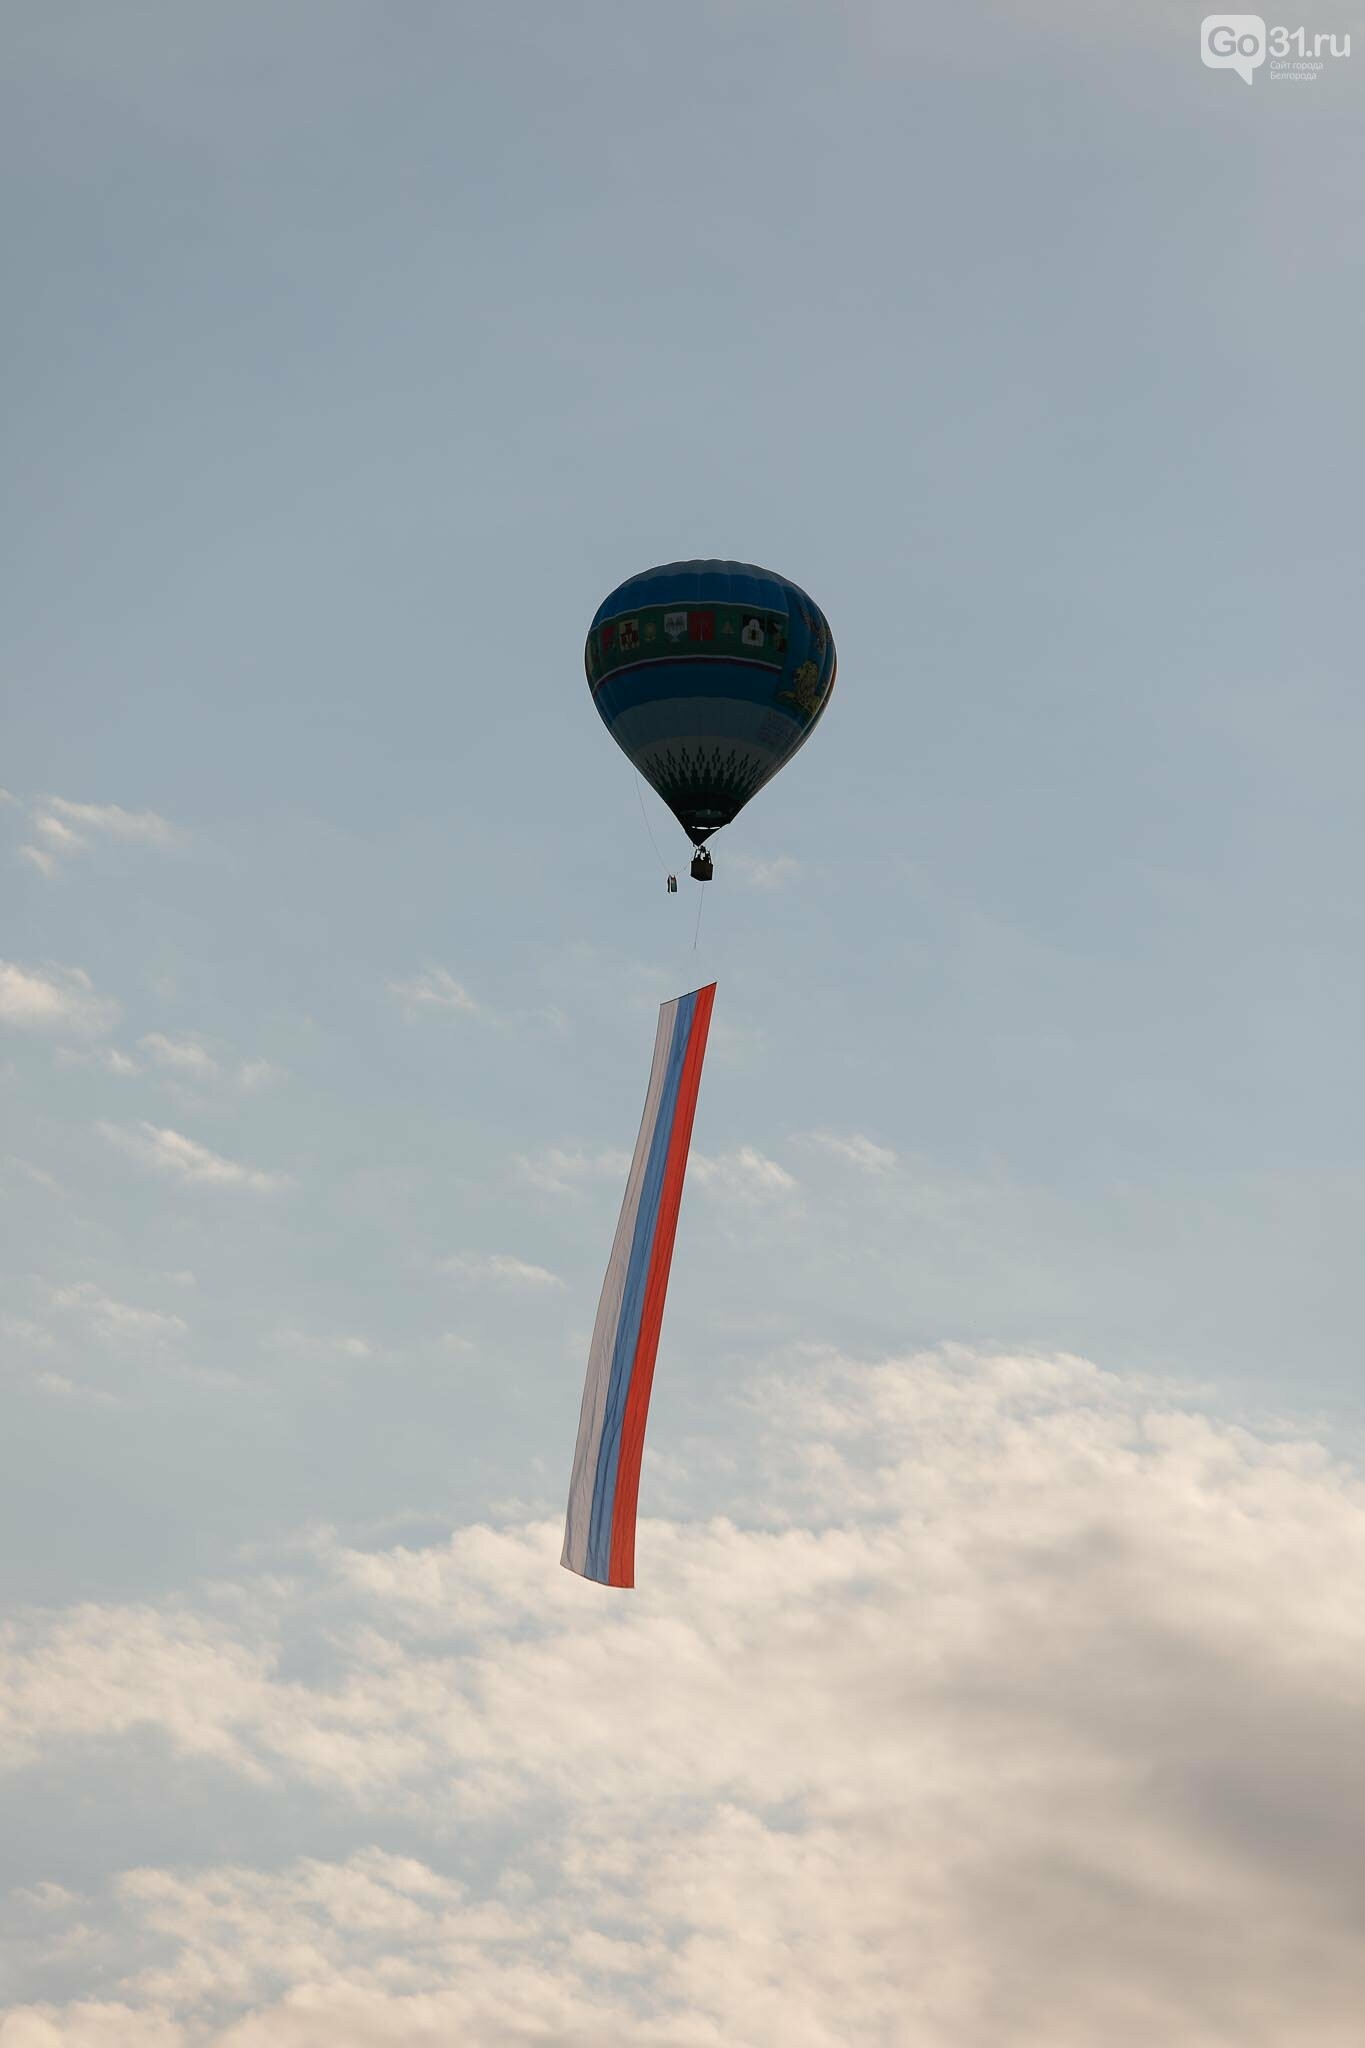 Над Белгородом пролетел аэростат с гигантским триколором, фото-25, Фото: Антон Вергун